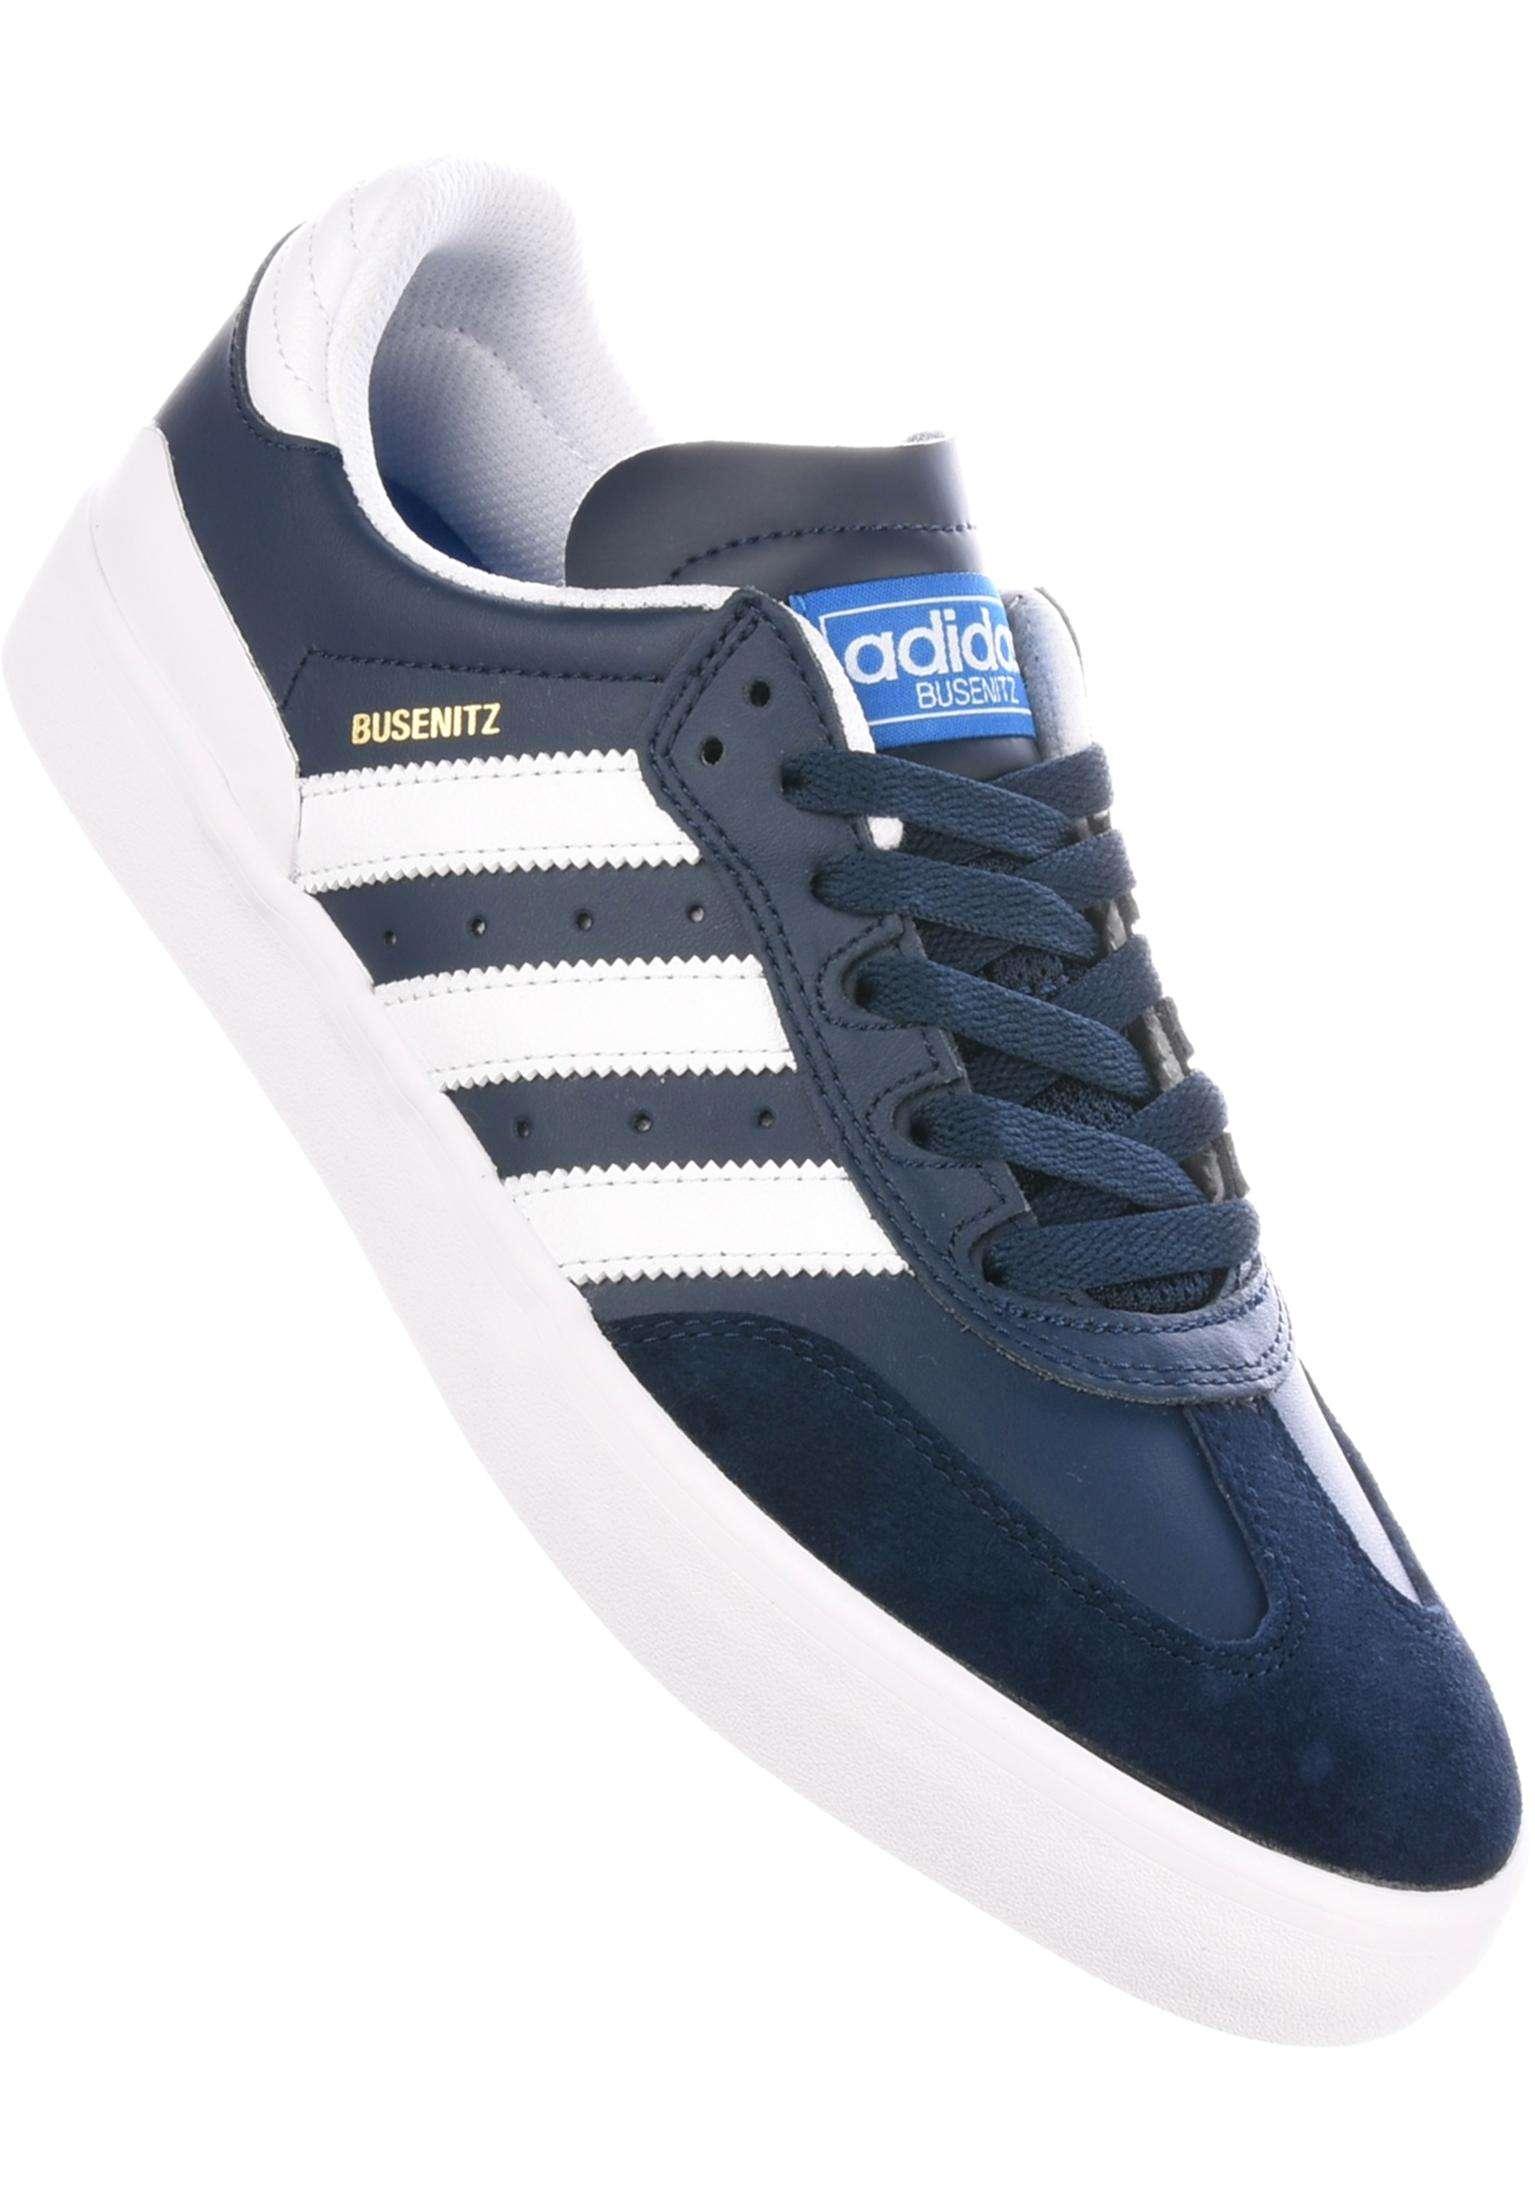 Busenitz Vulc Samba Edition adidas-skateboarding All Shoes in navy-white-bluebird  for Men  ca9230981363c